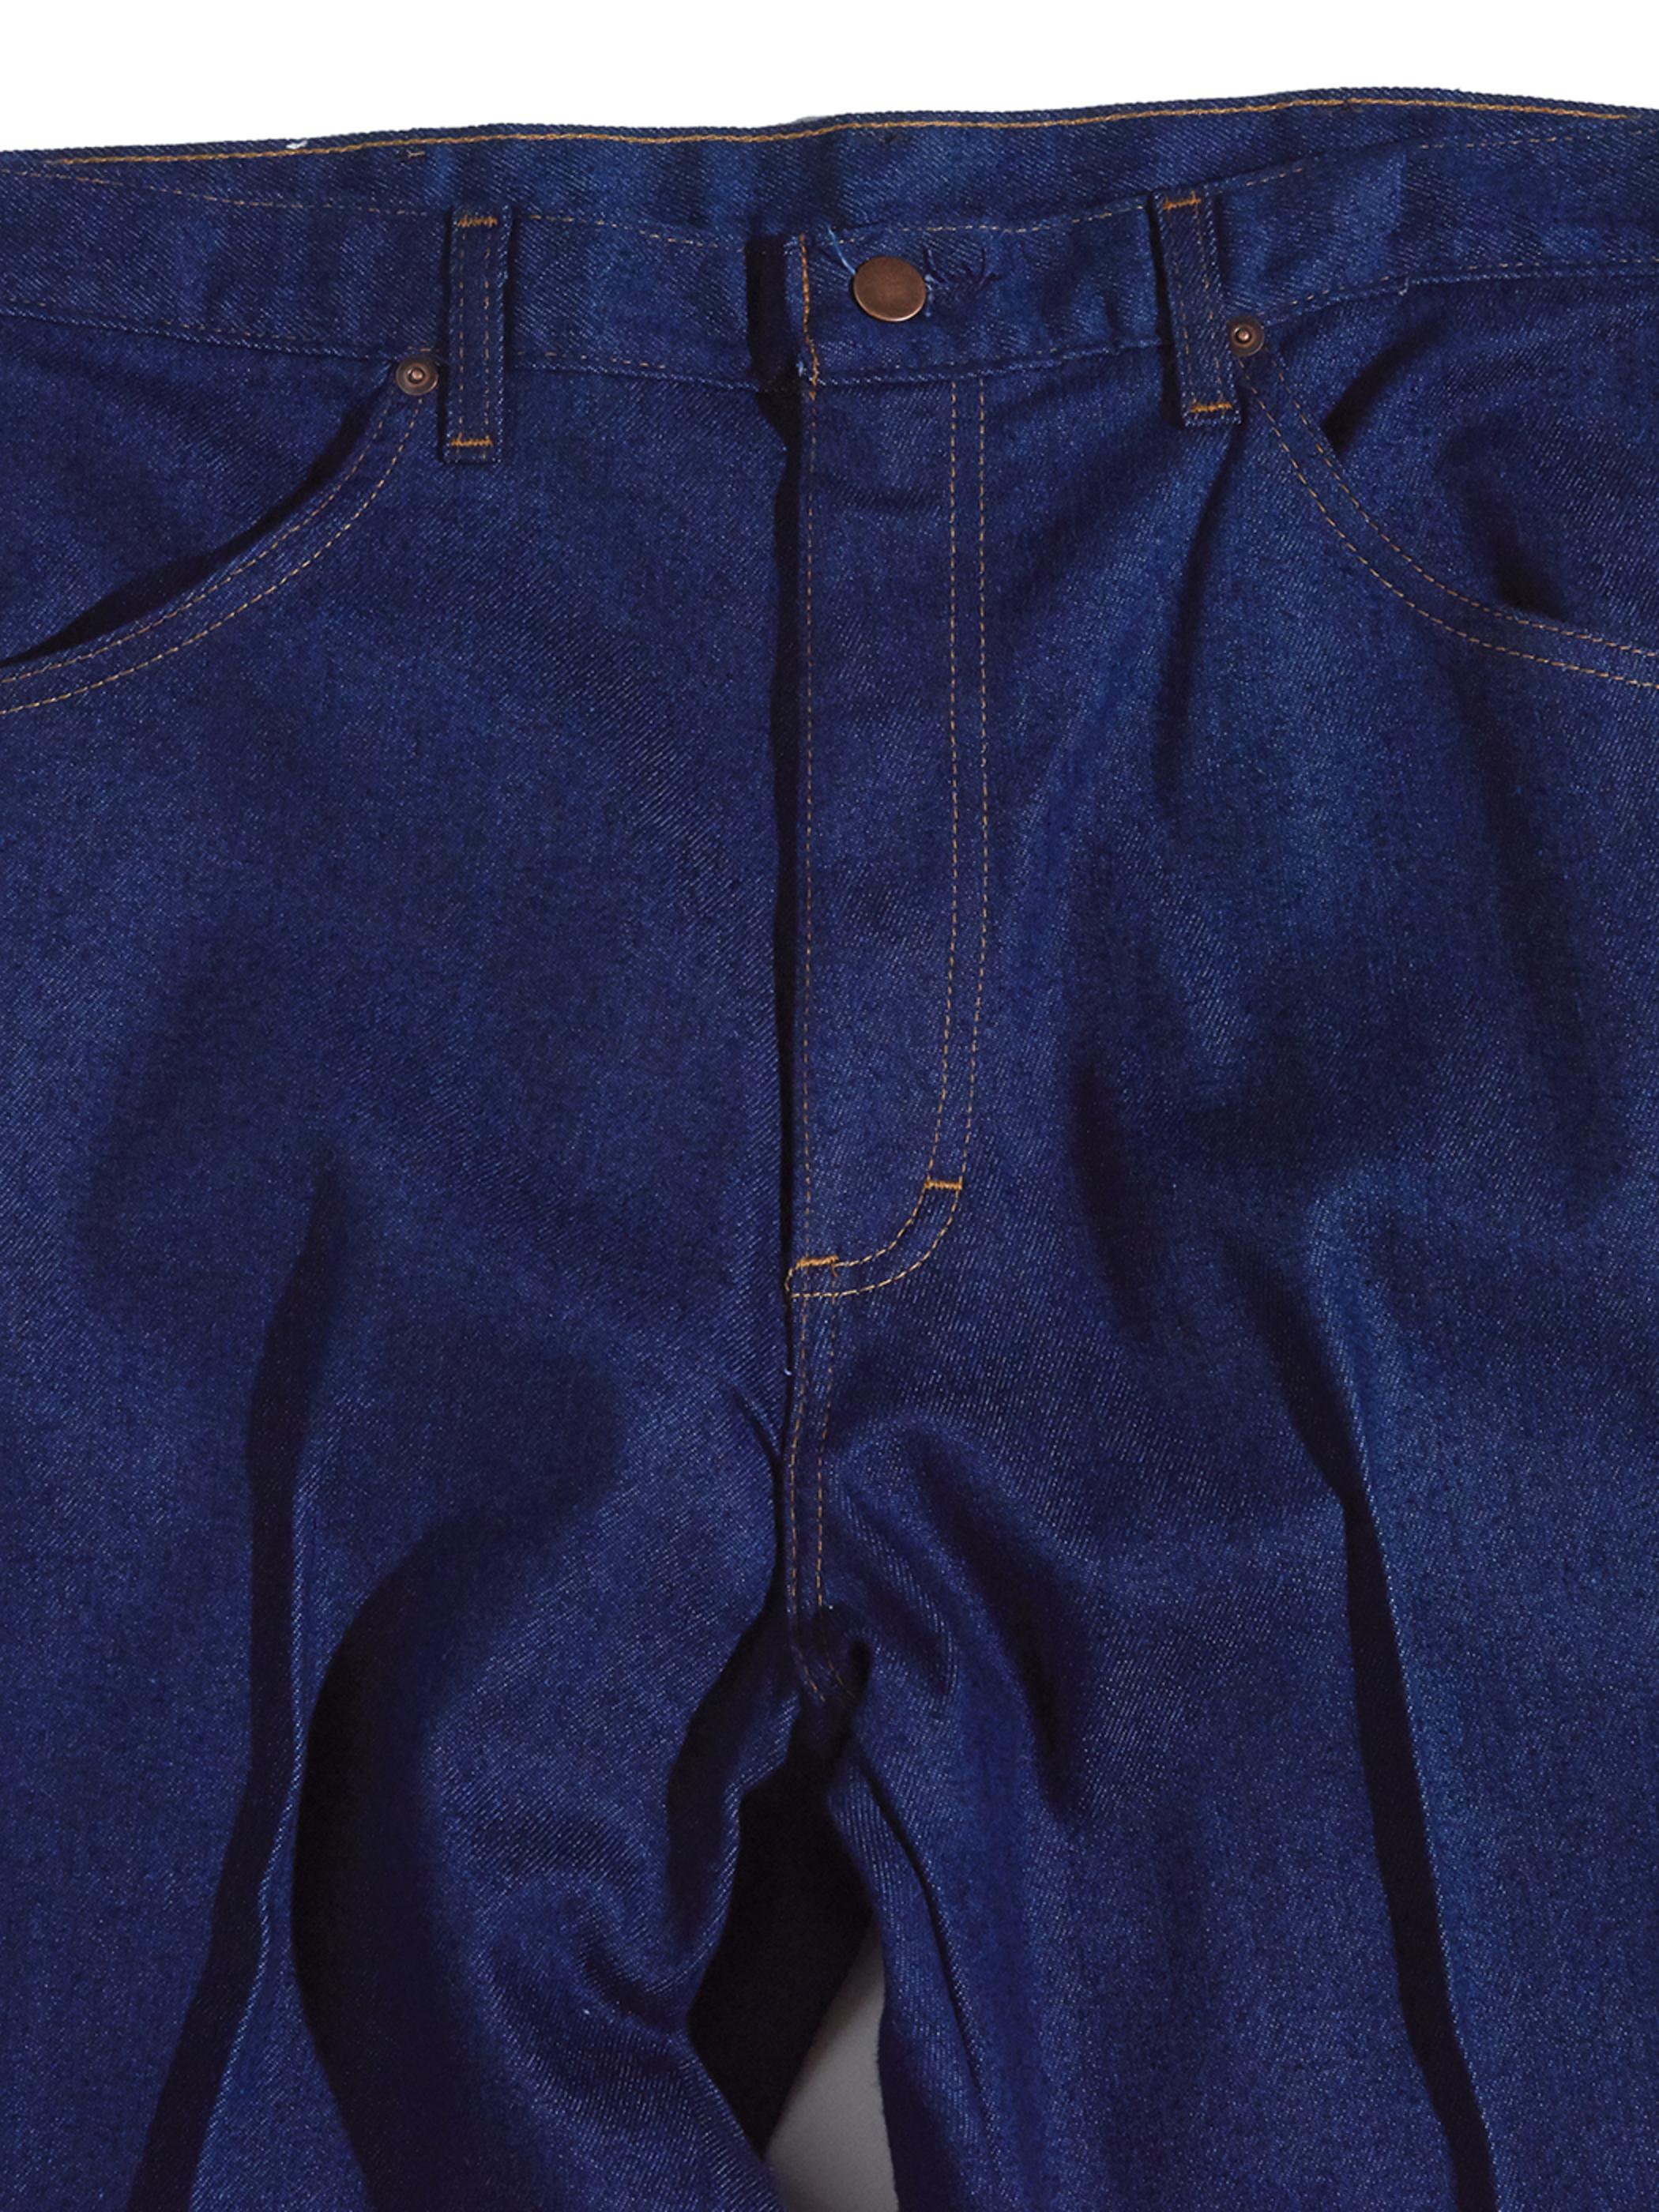 "NOS 1990s ""Roebucks"" custom center crease denim pants -INDIGO-"